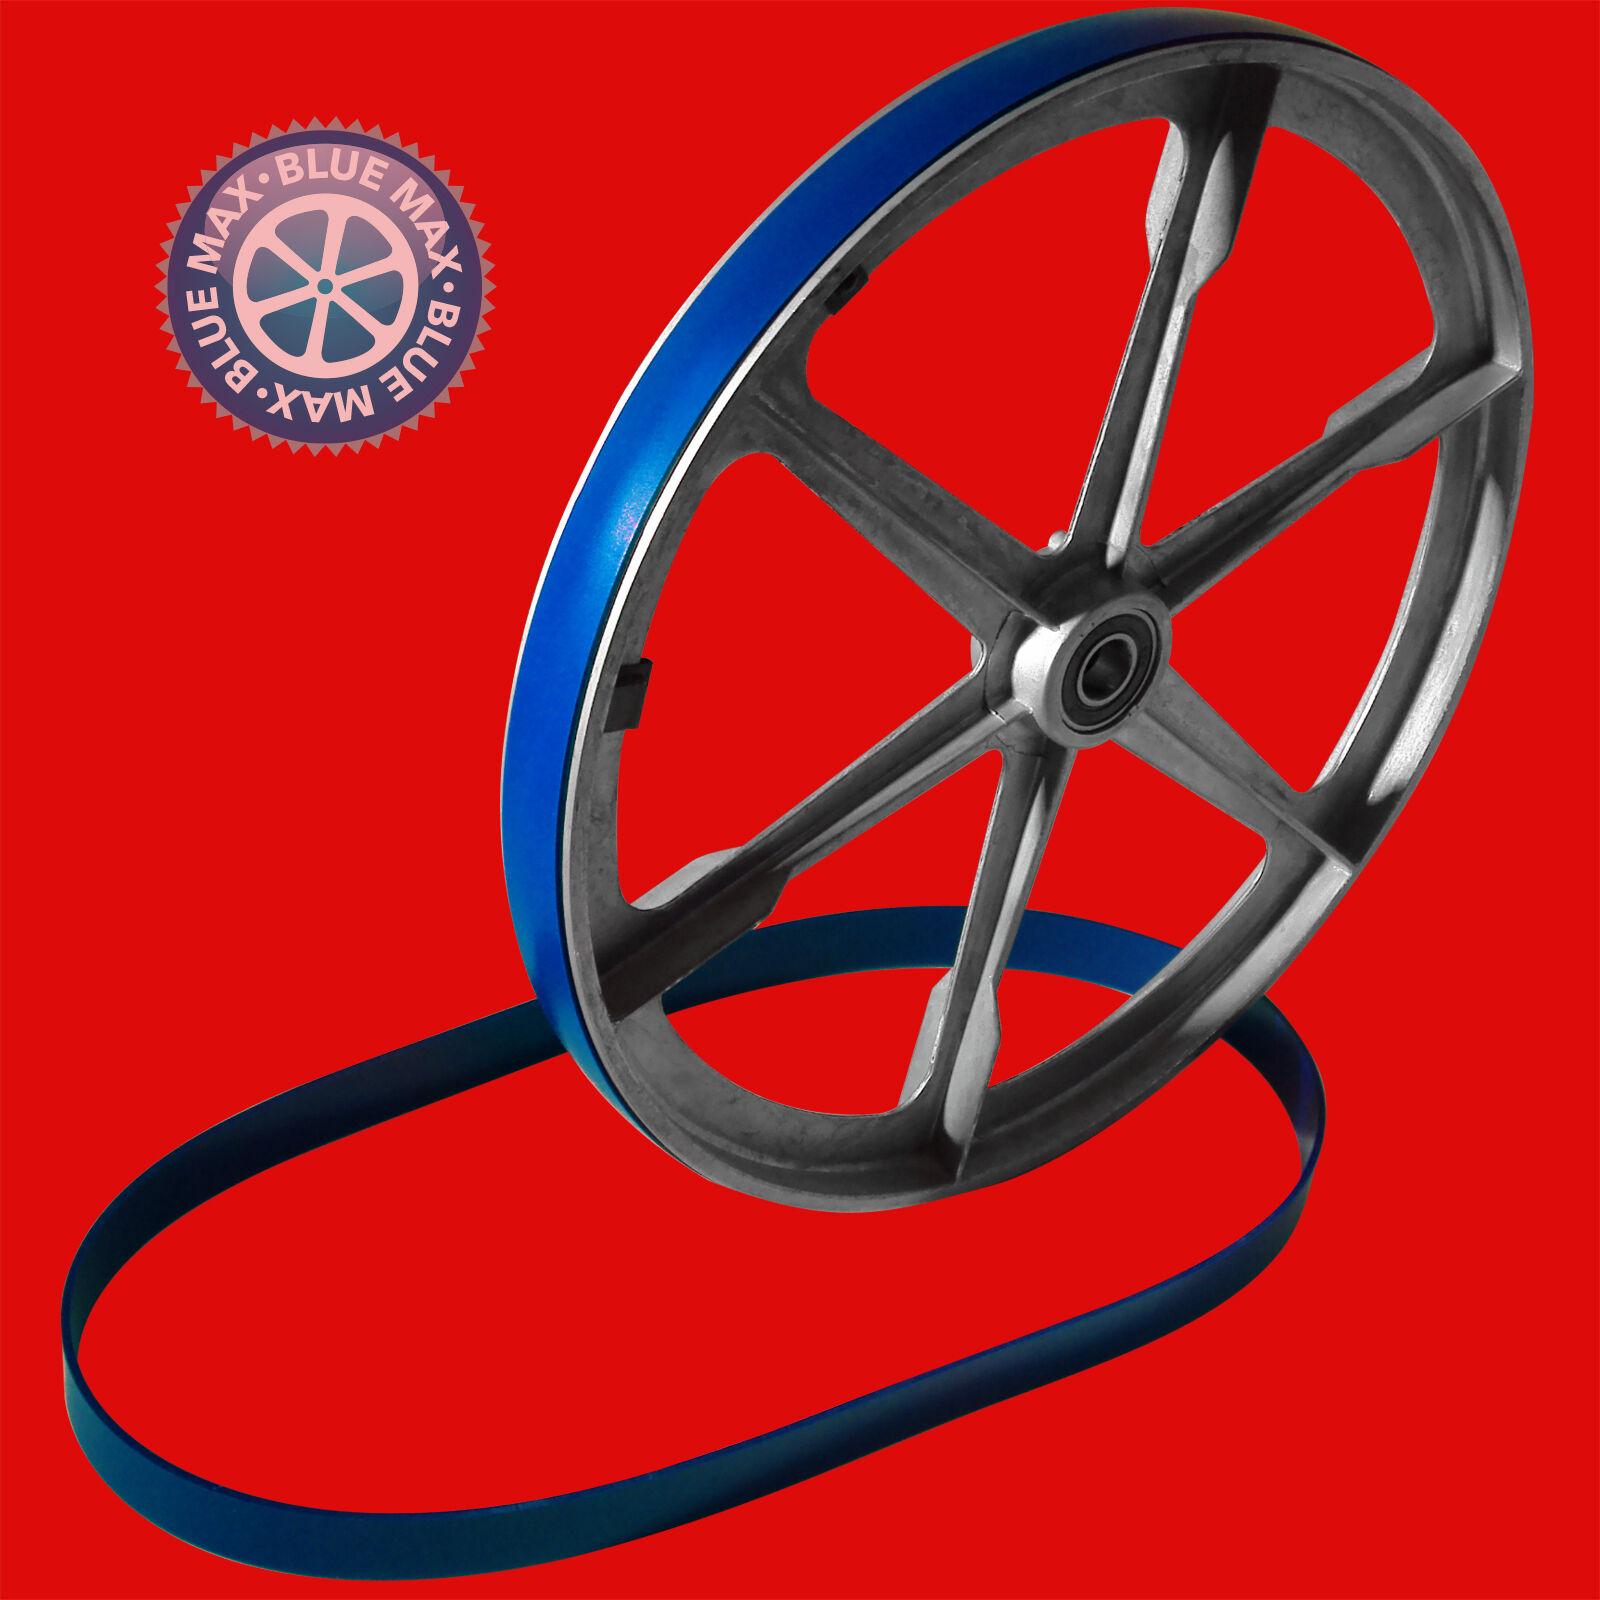 2 Blaues Max Muy Cinta Sierra Neumáticos para 17  Rey Industrial Kc-1702fxb